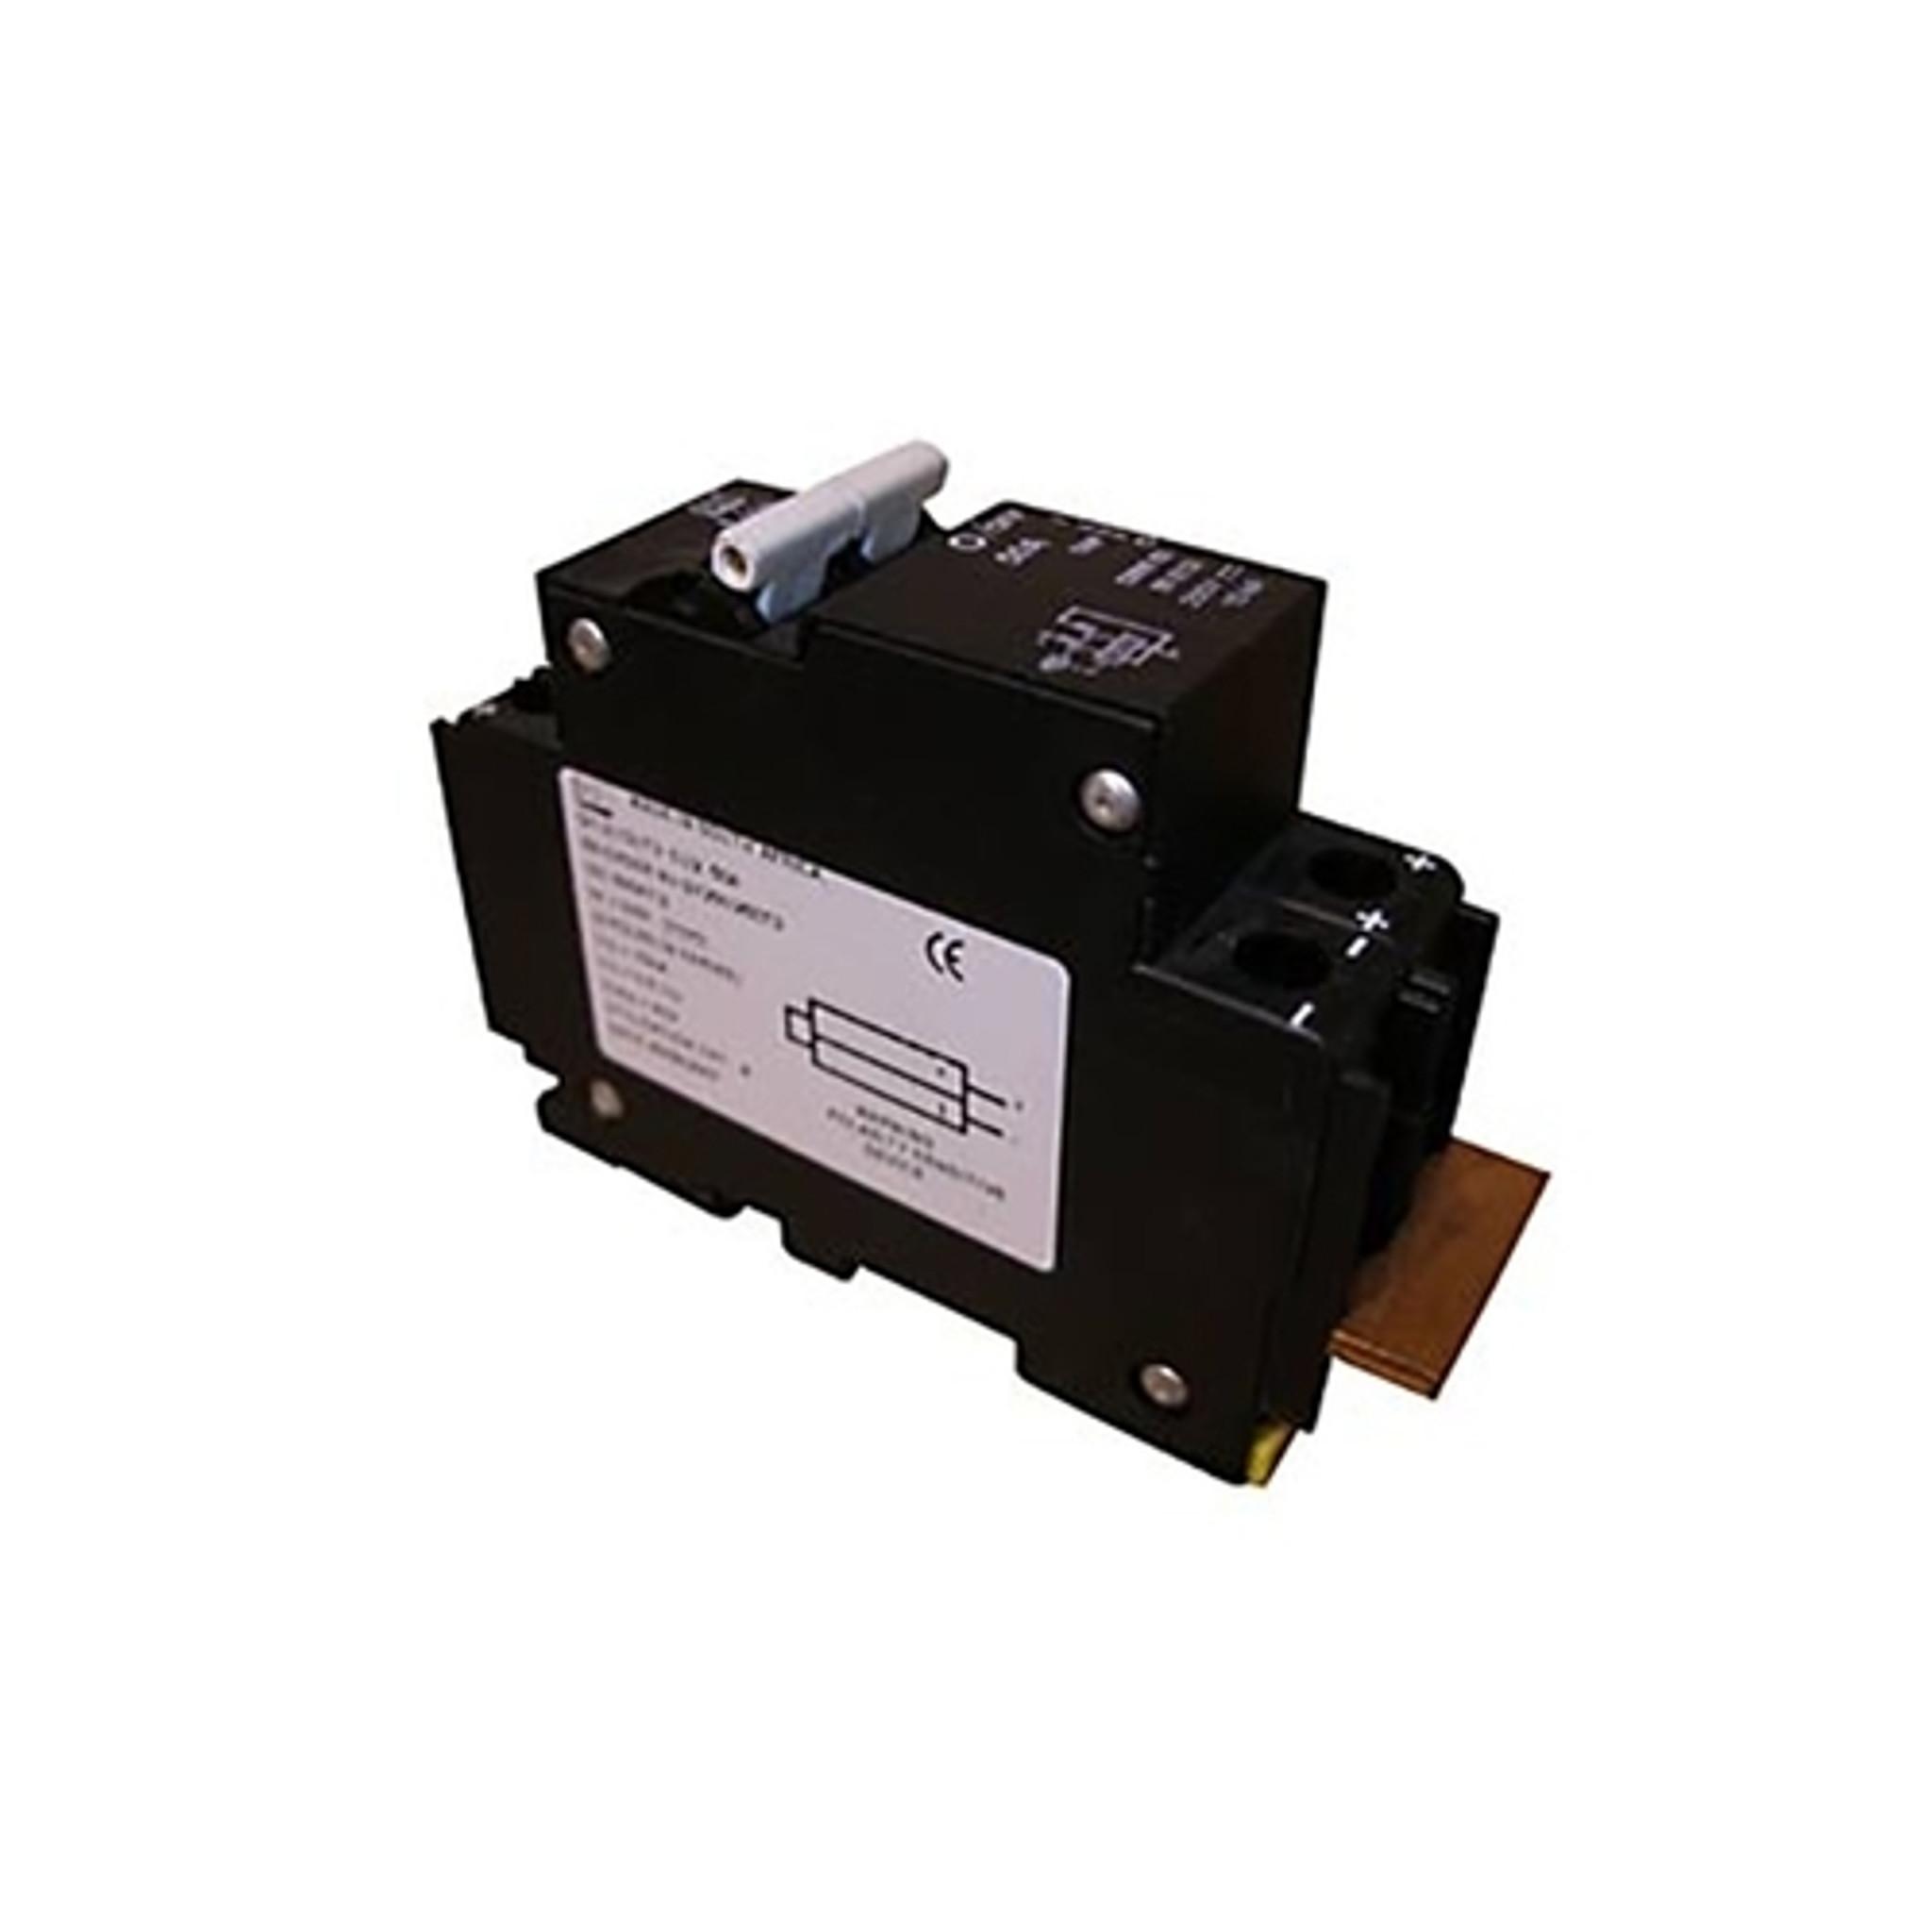 midnite solar 15a 150 circuit breaker  [ 2048 x 2048 Pixel ]